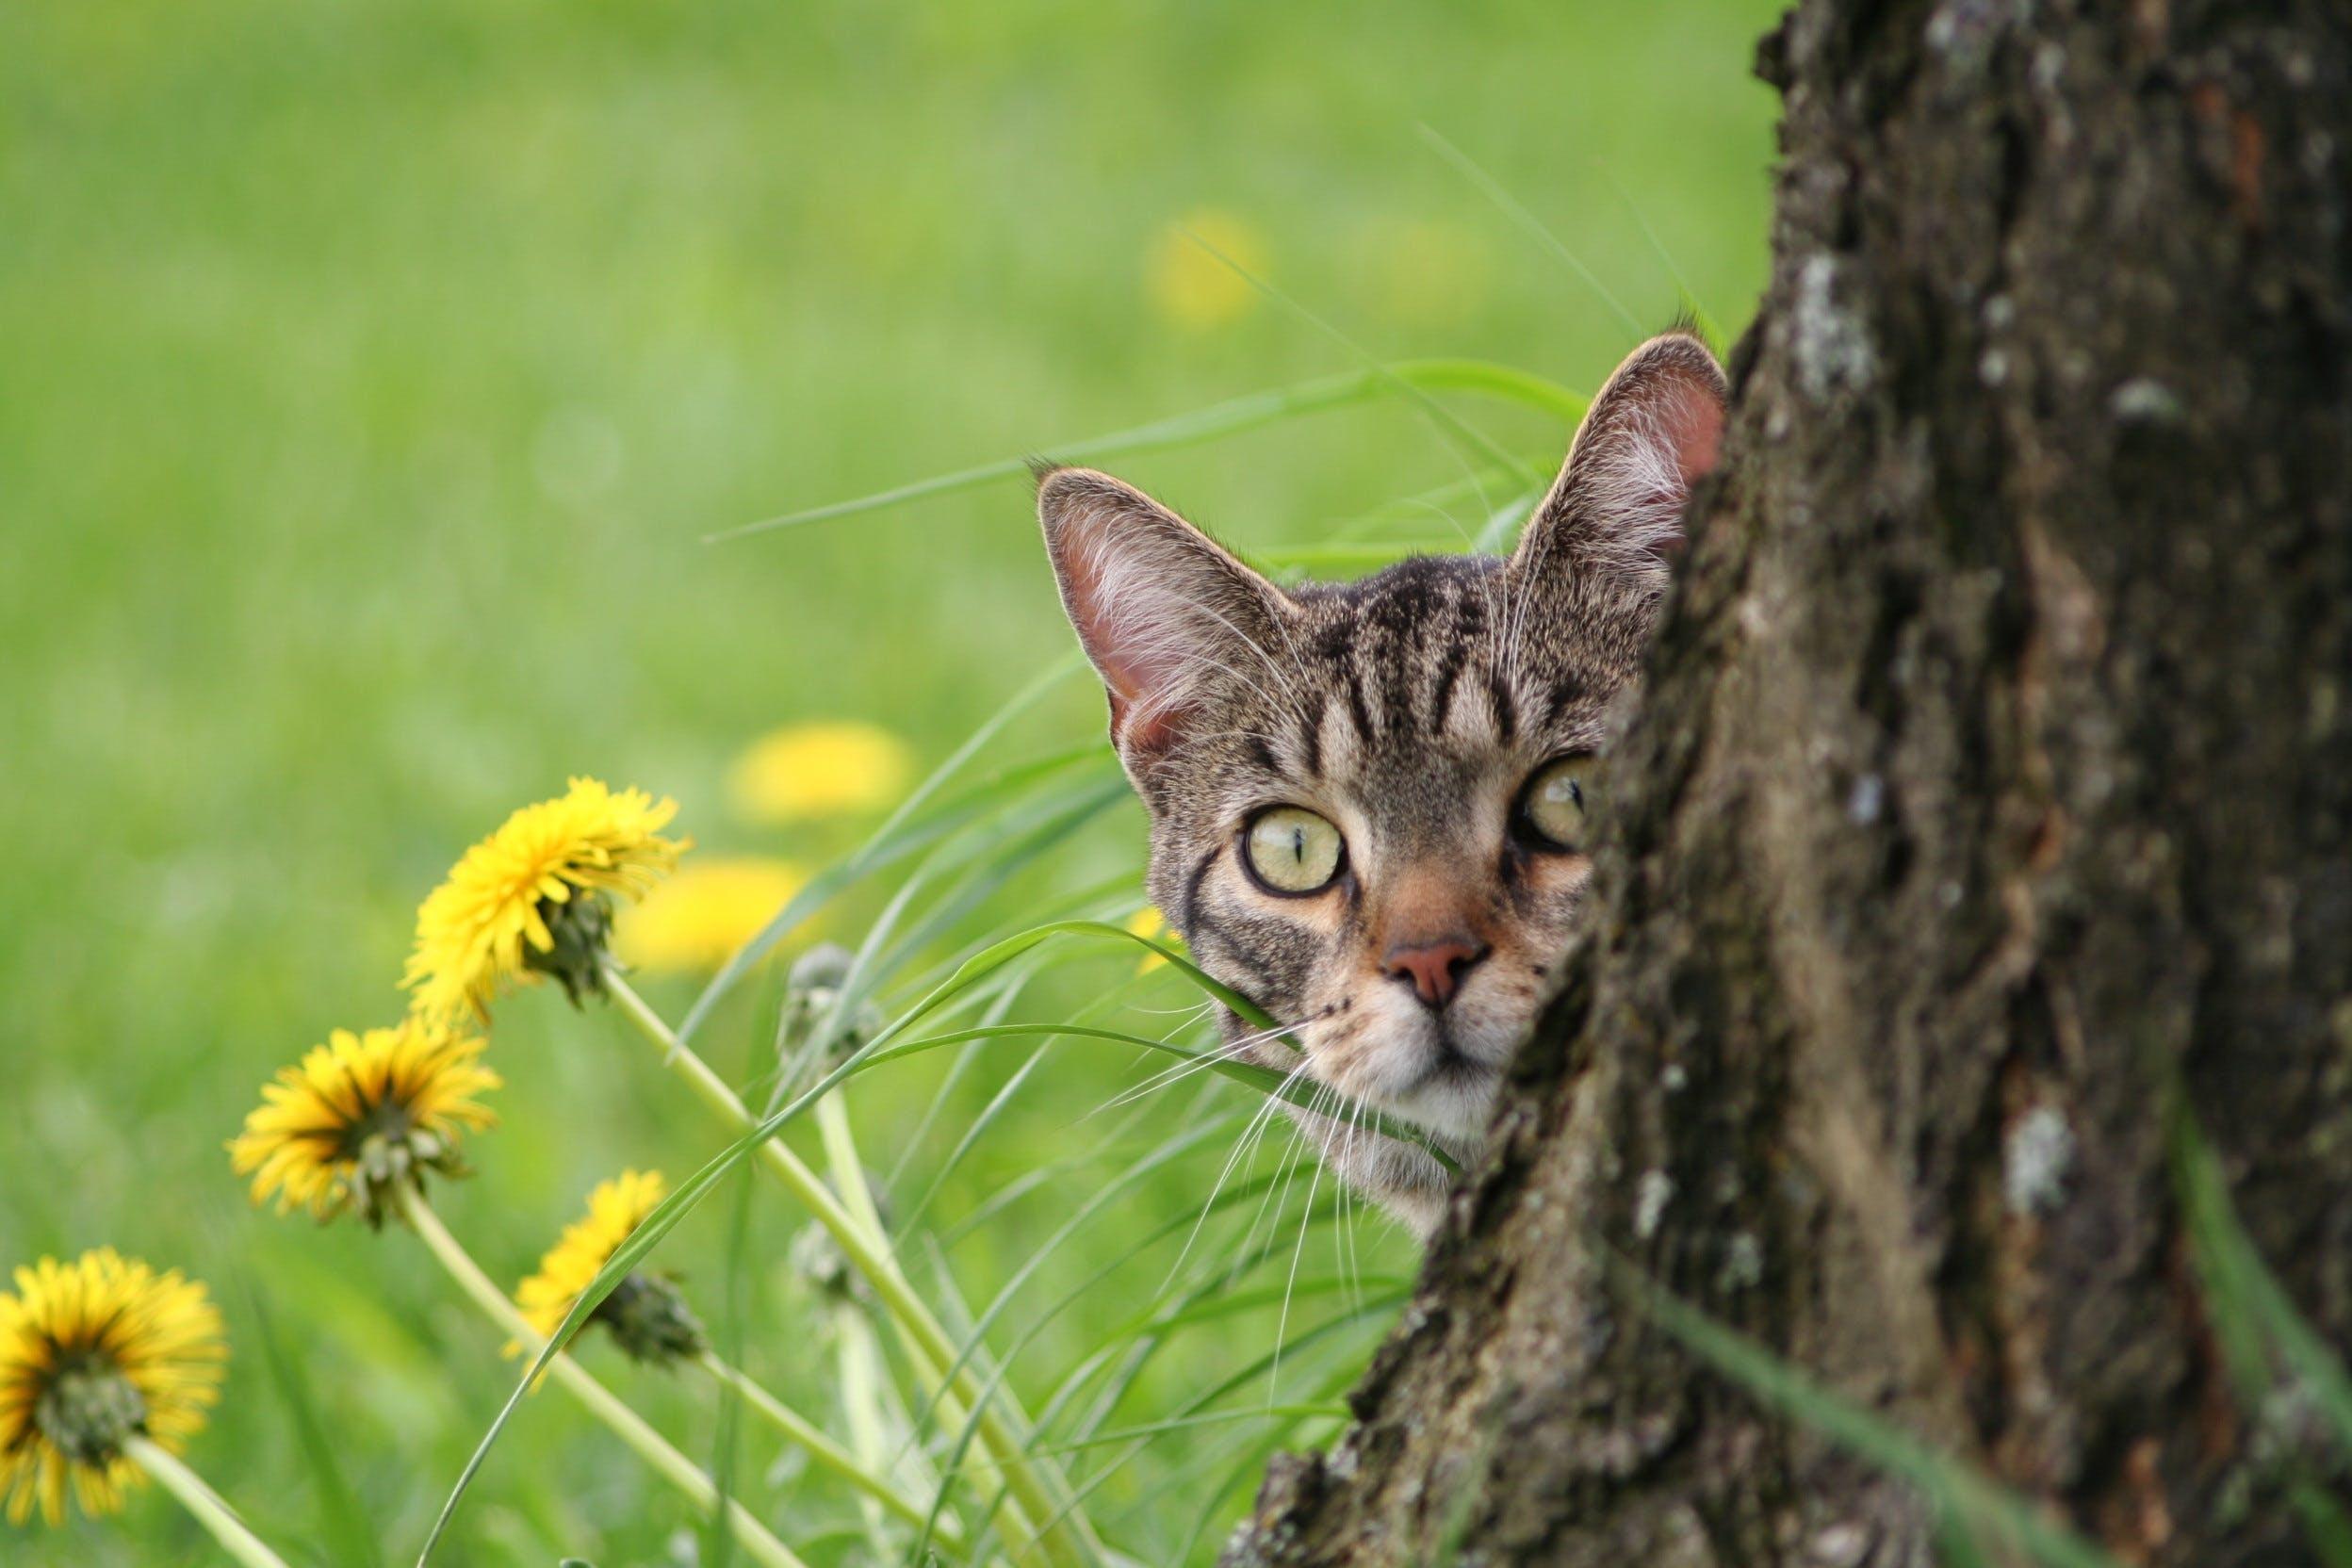 Brown Tabby Cat Hiding in Tree